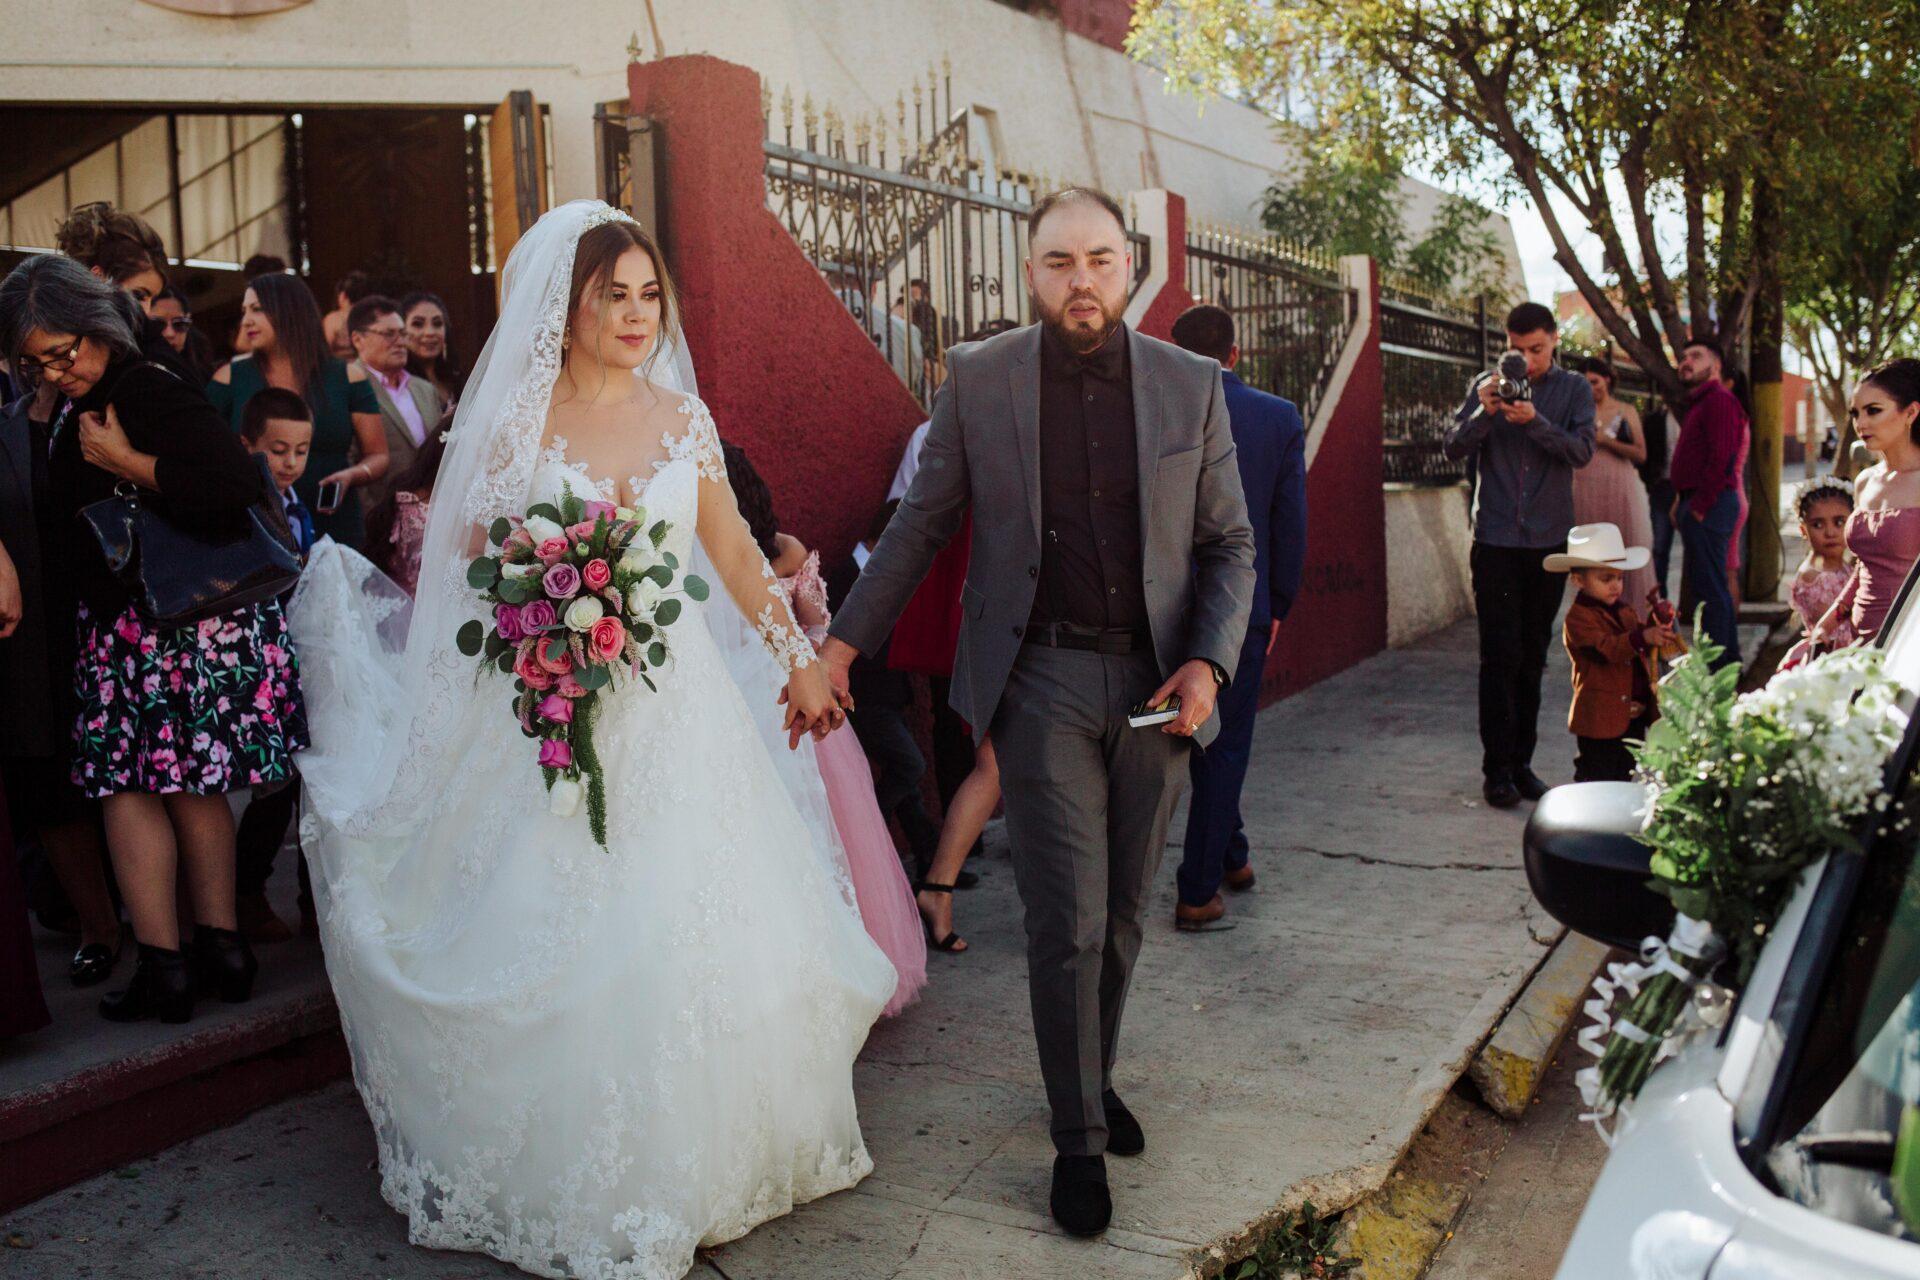 javier_noriega_fotografo_bodas_zacatecas_fresnillo_chihuahua_wedding_photographer9